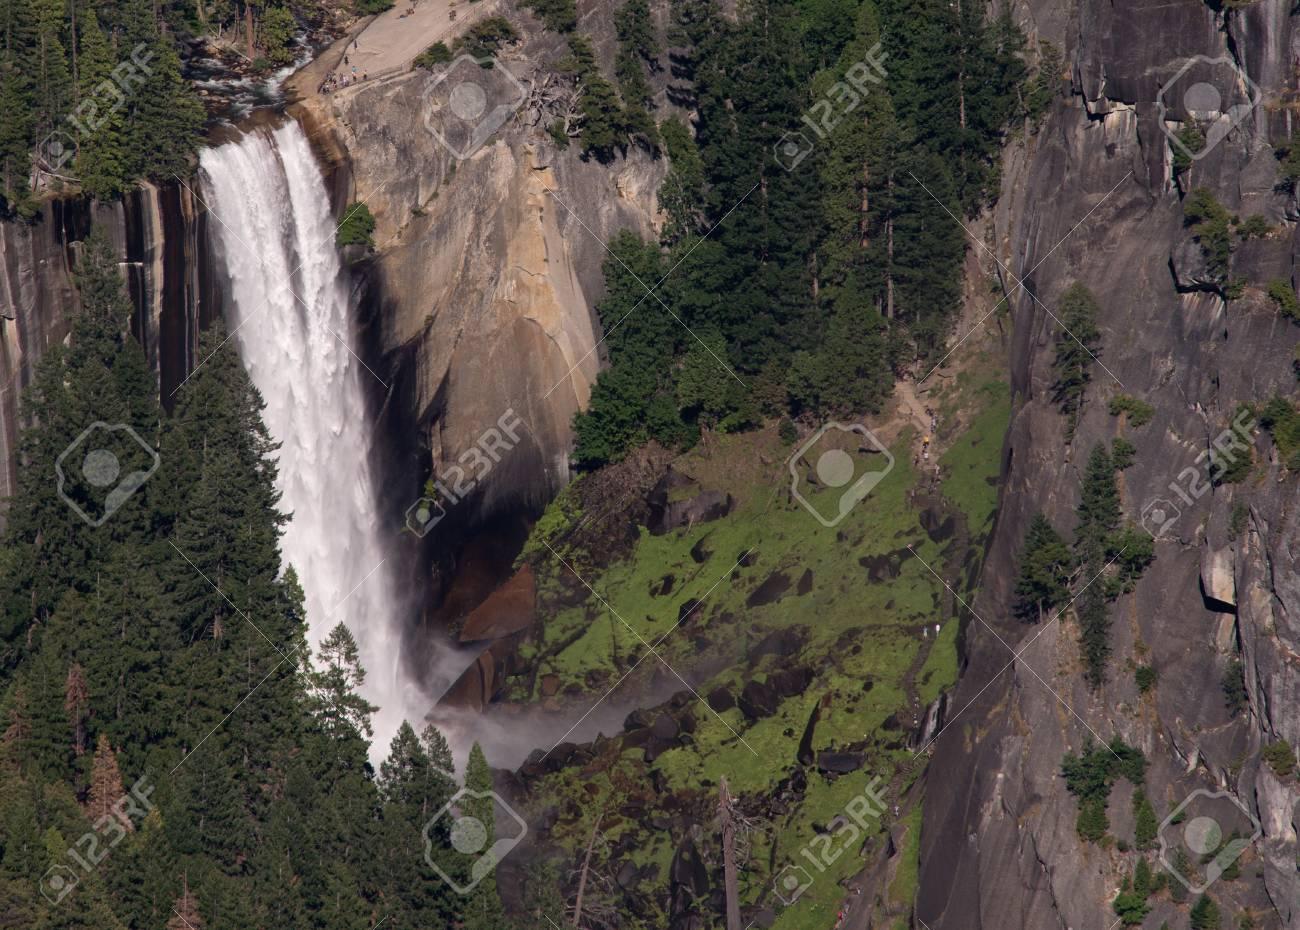 Yosemite Falls from Glacier Point, Yosemite National Park Stock Photo - 74449366